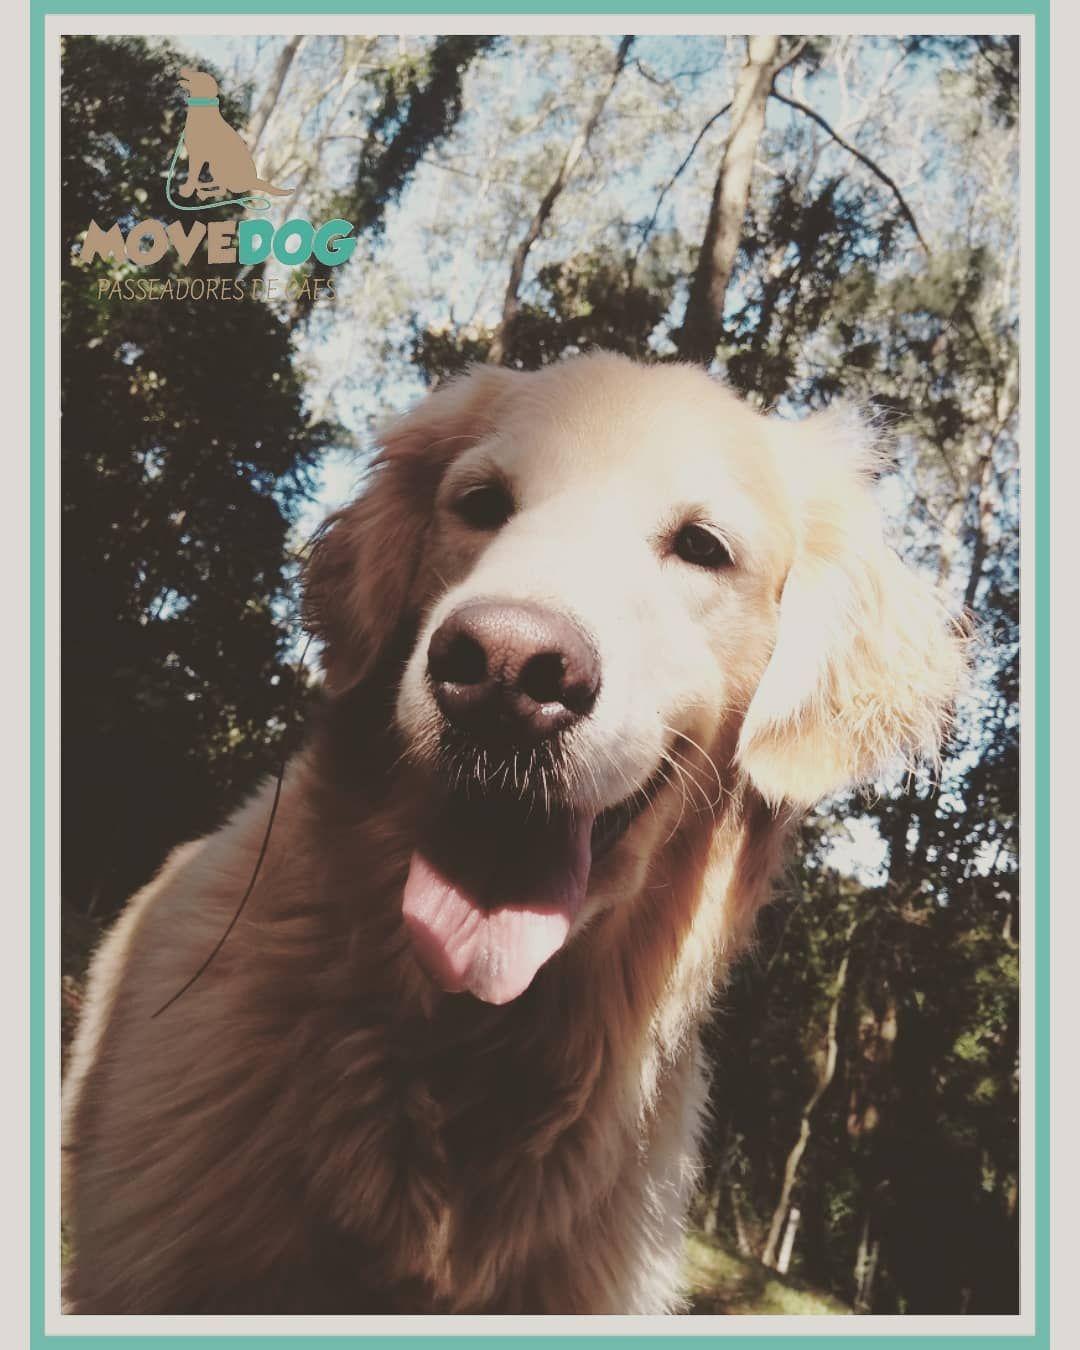 Benta Riqueza Seucaofelizemmovimento Movedog